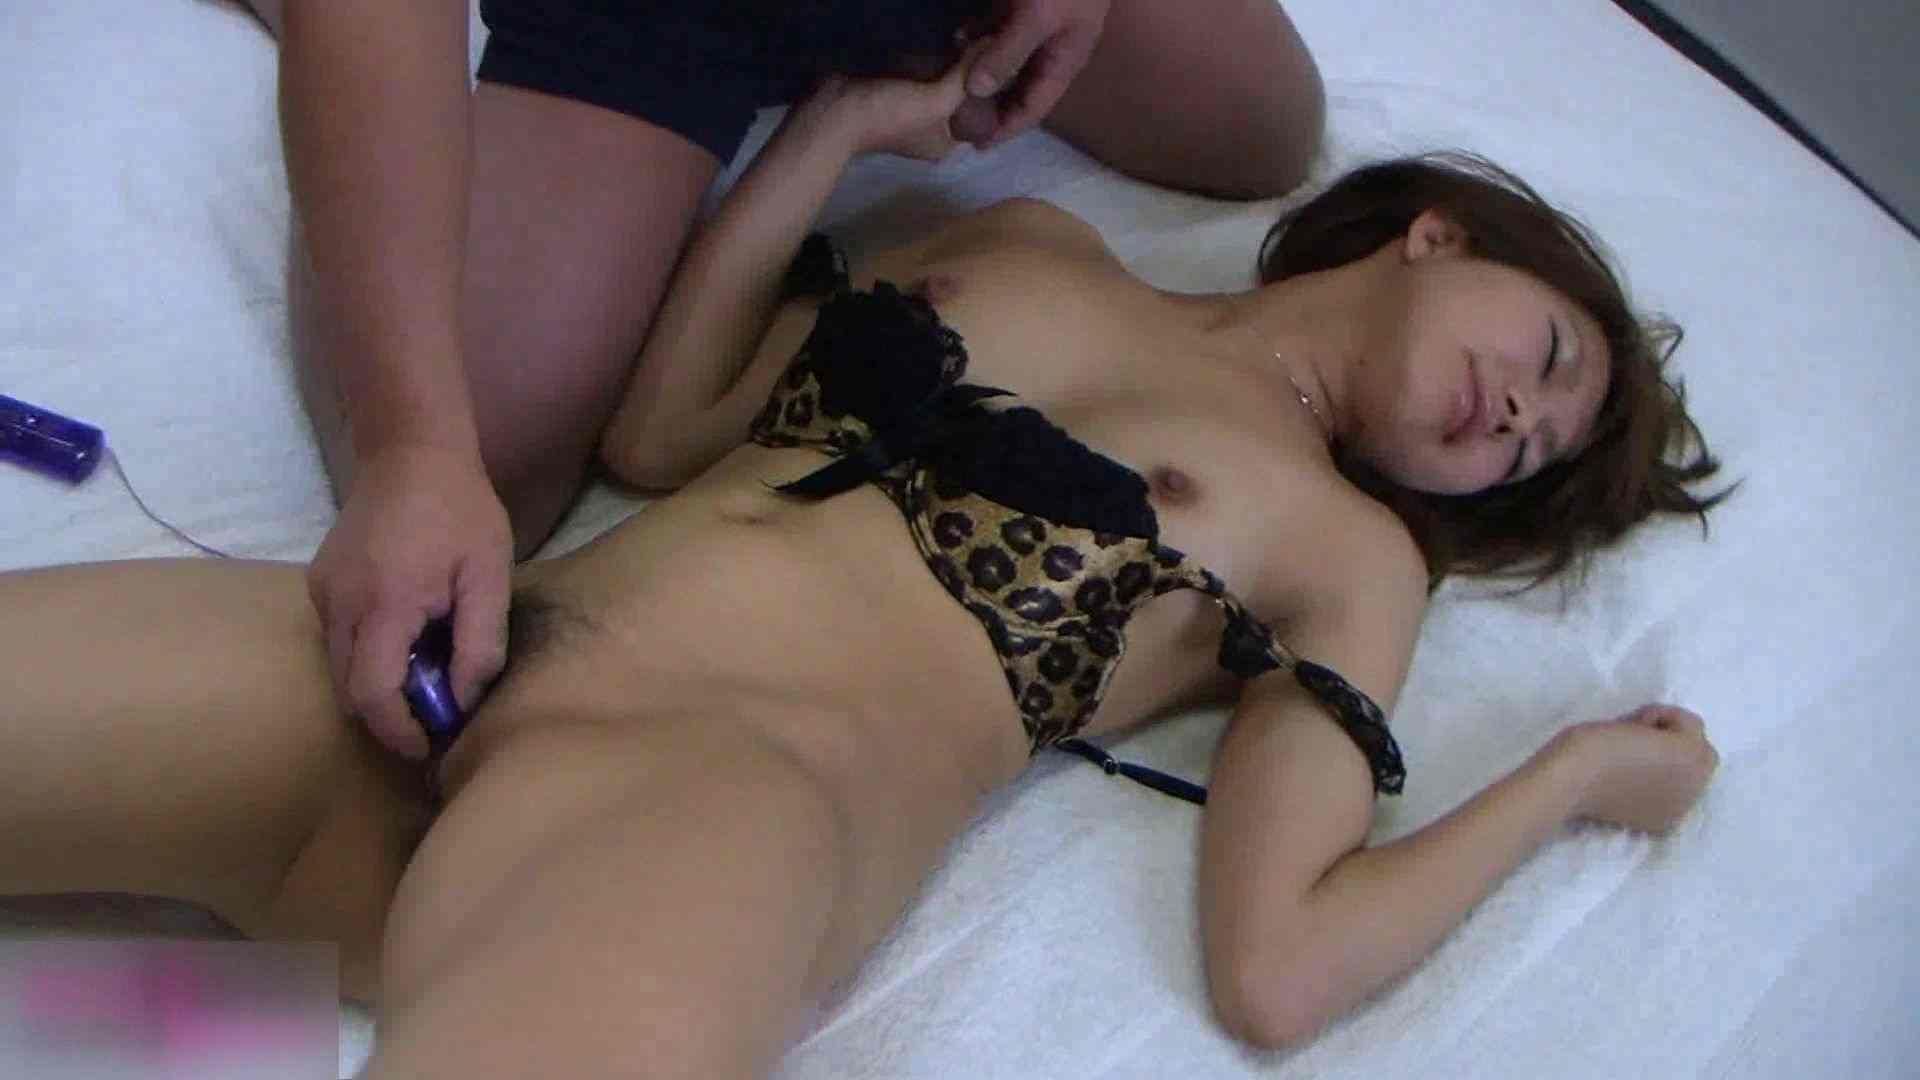 S級厳選美女ビッチガールVol.05 エッチなセックス 戯れ無修正画像 78画像 54